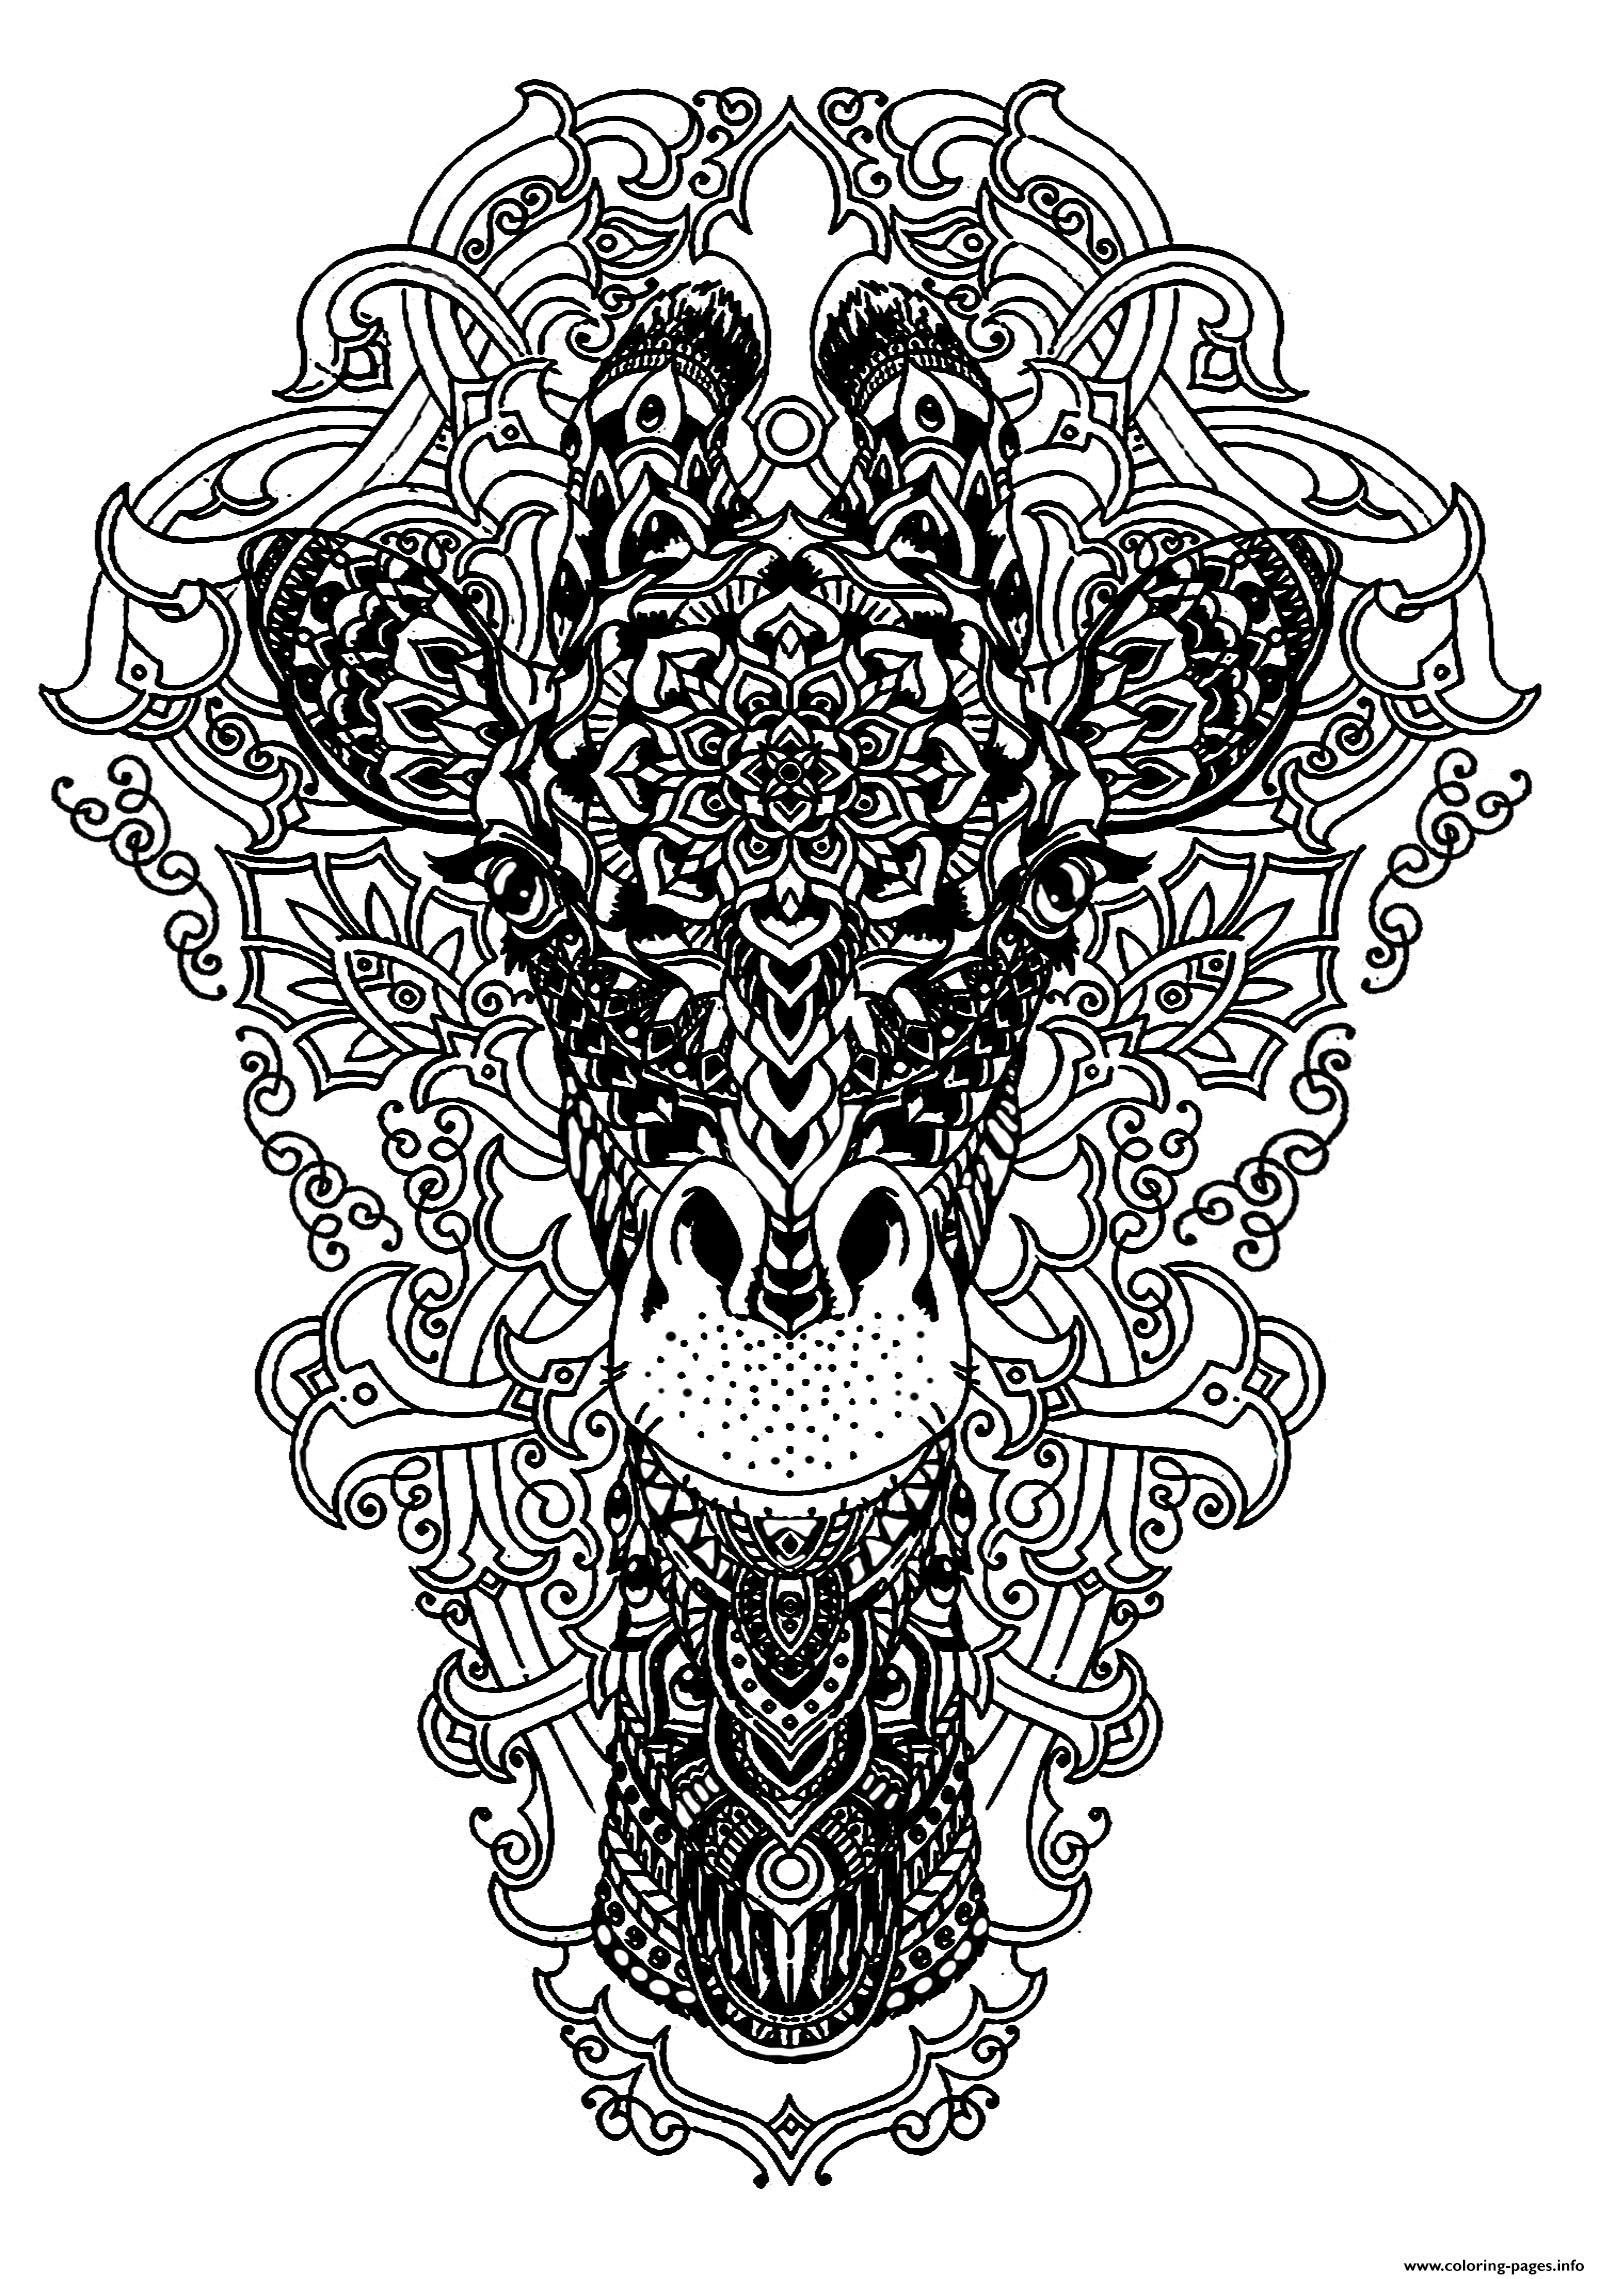 Advanced Animal Head Of A Giraffe